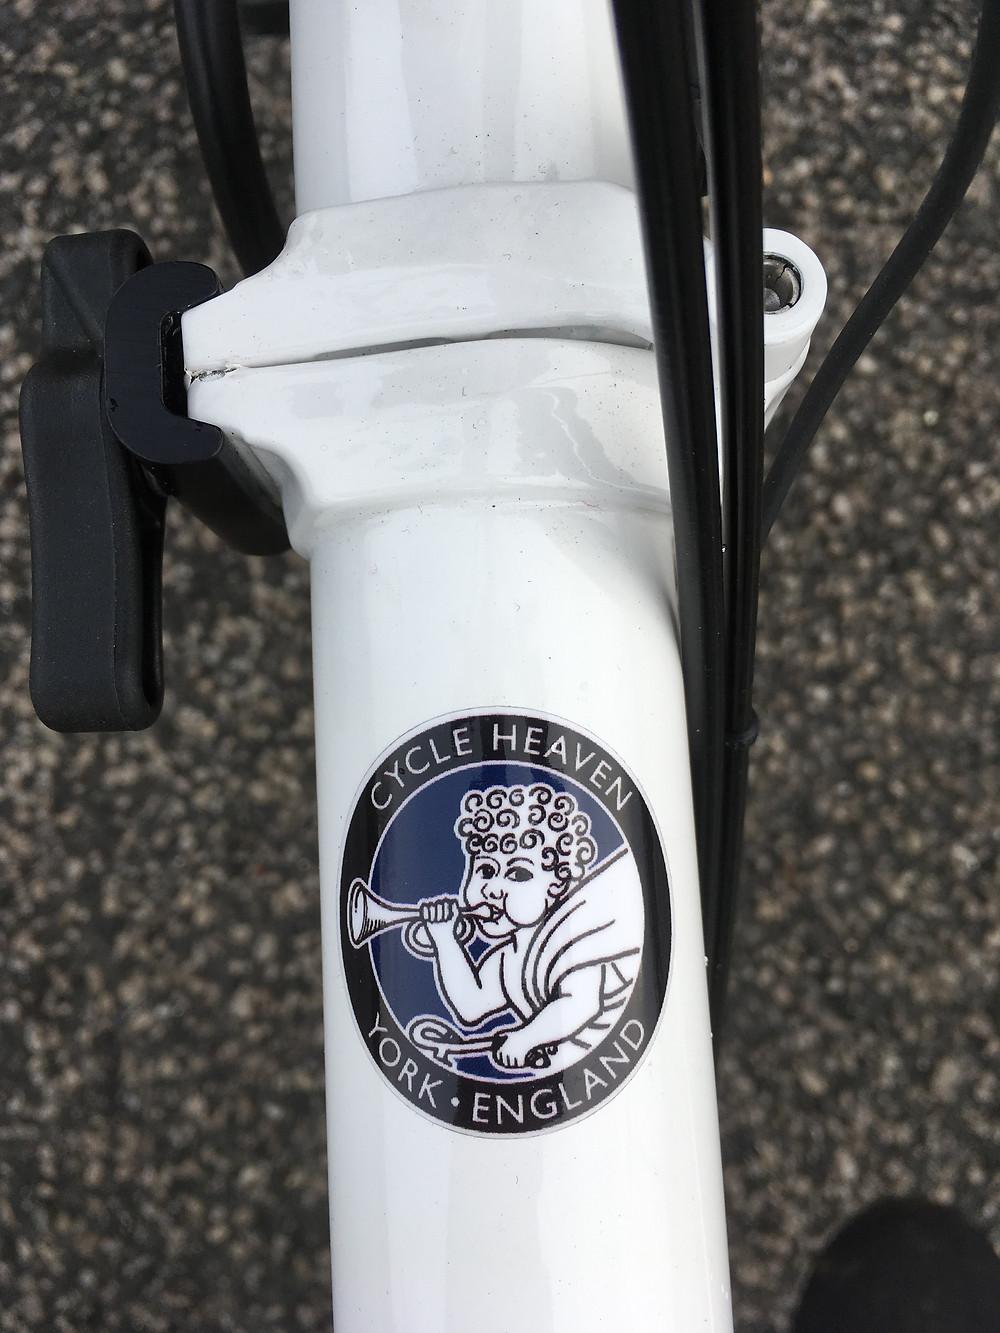 Brompton electric cycle heaven york